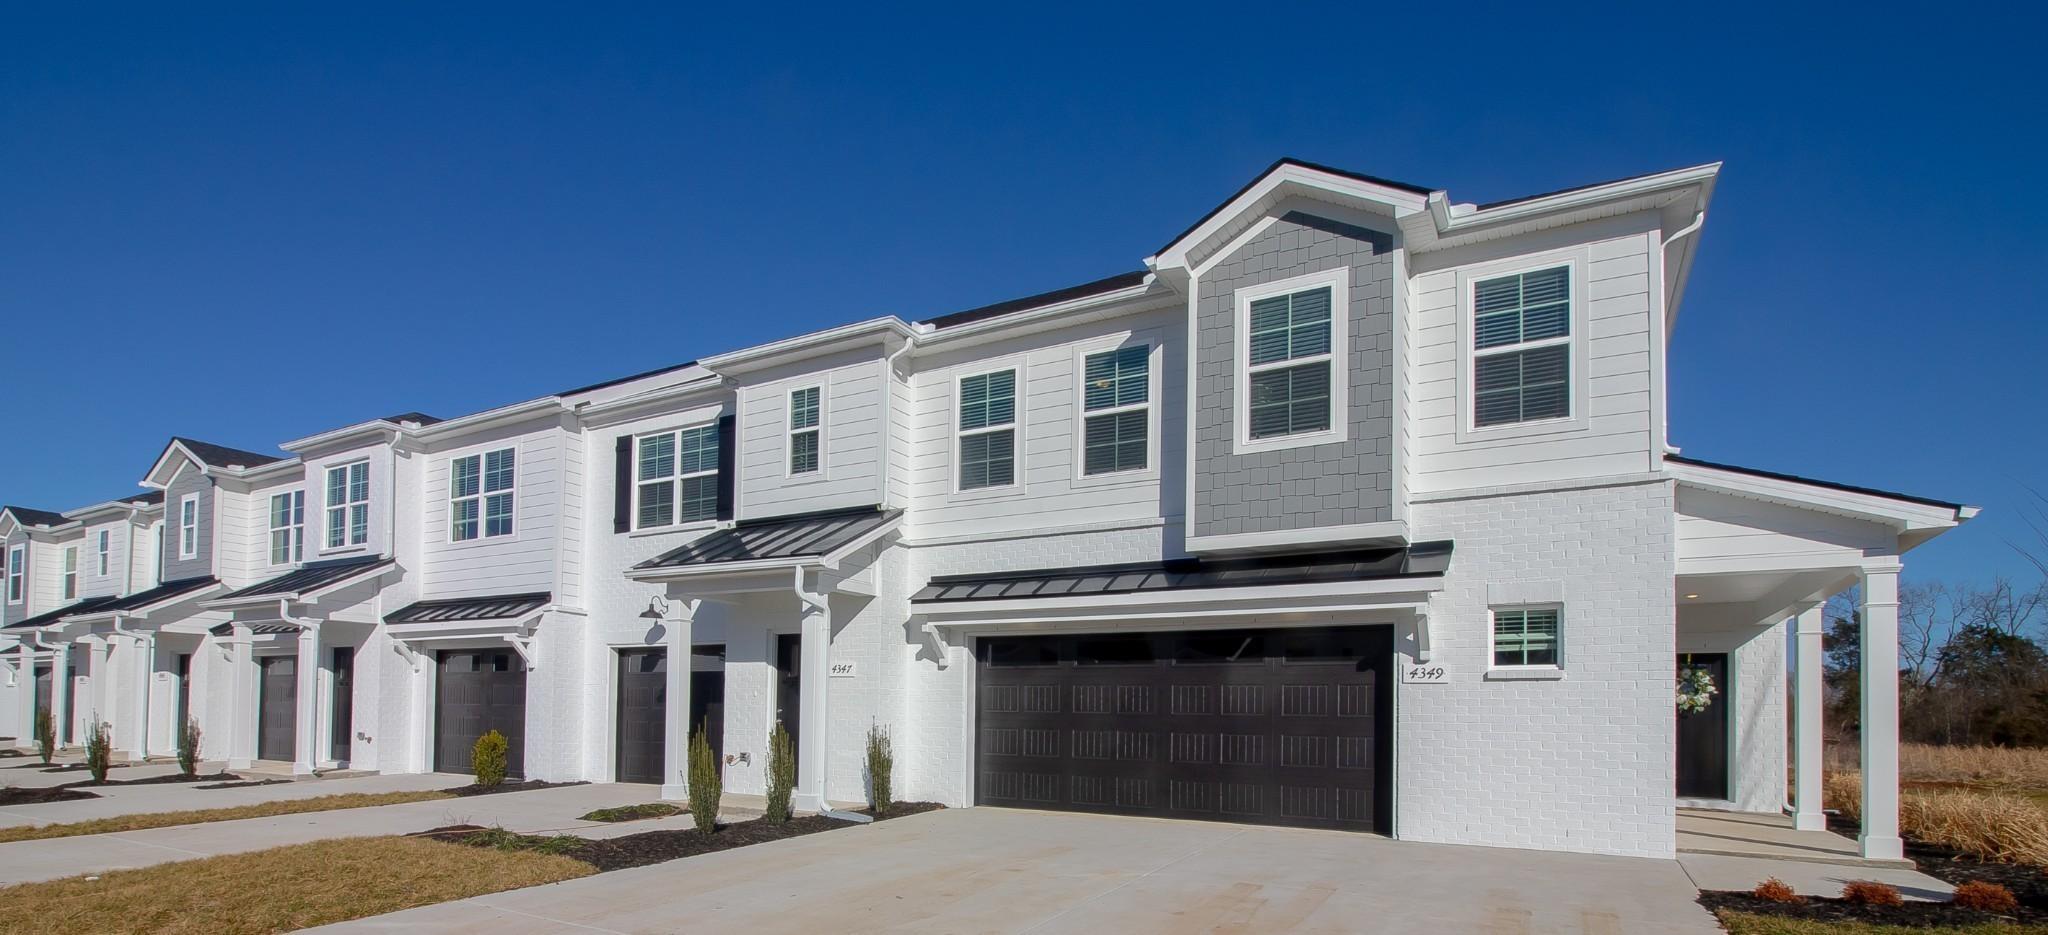 4215 Sarazen Ln Property Photo - Murfreesboro, TN real estate listing